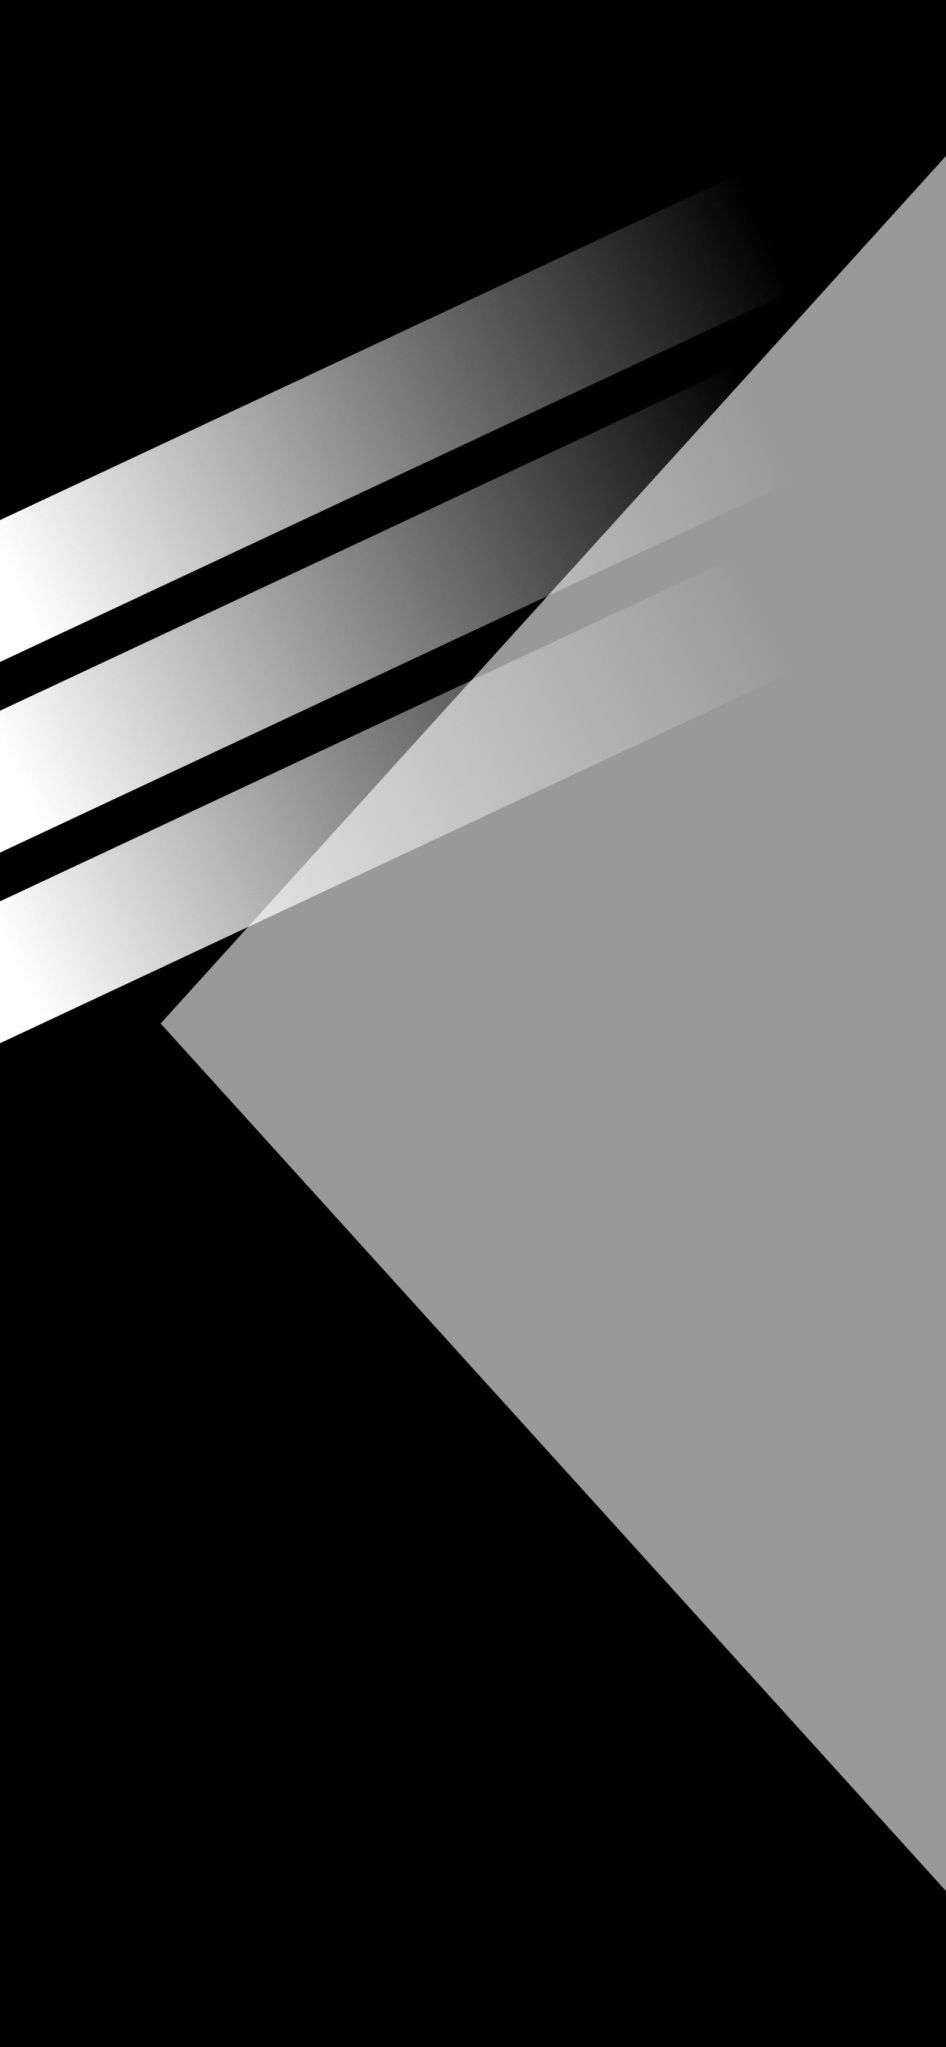 Hotspot4u Art Graphic Wallpapers Designer Black Wallpaper Iphone Dark Black Wallpaper Iphone Dark Phone Wallpapers